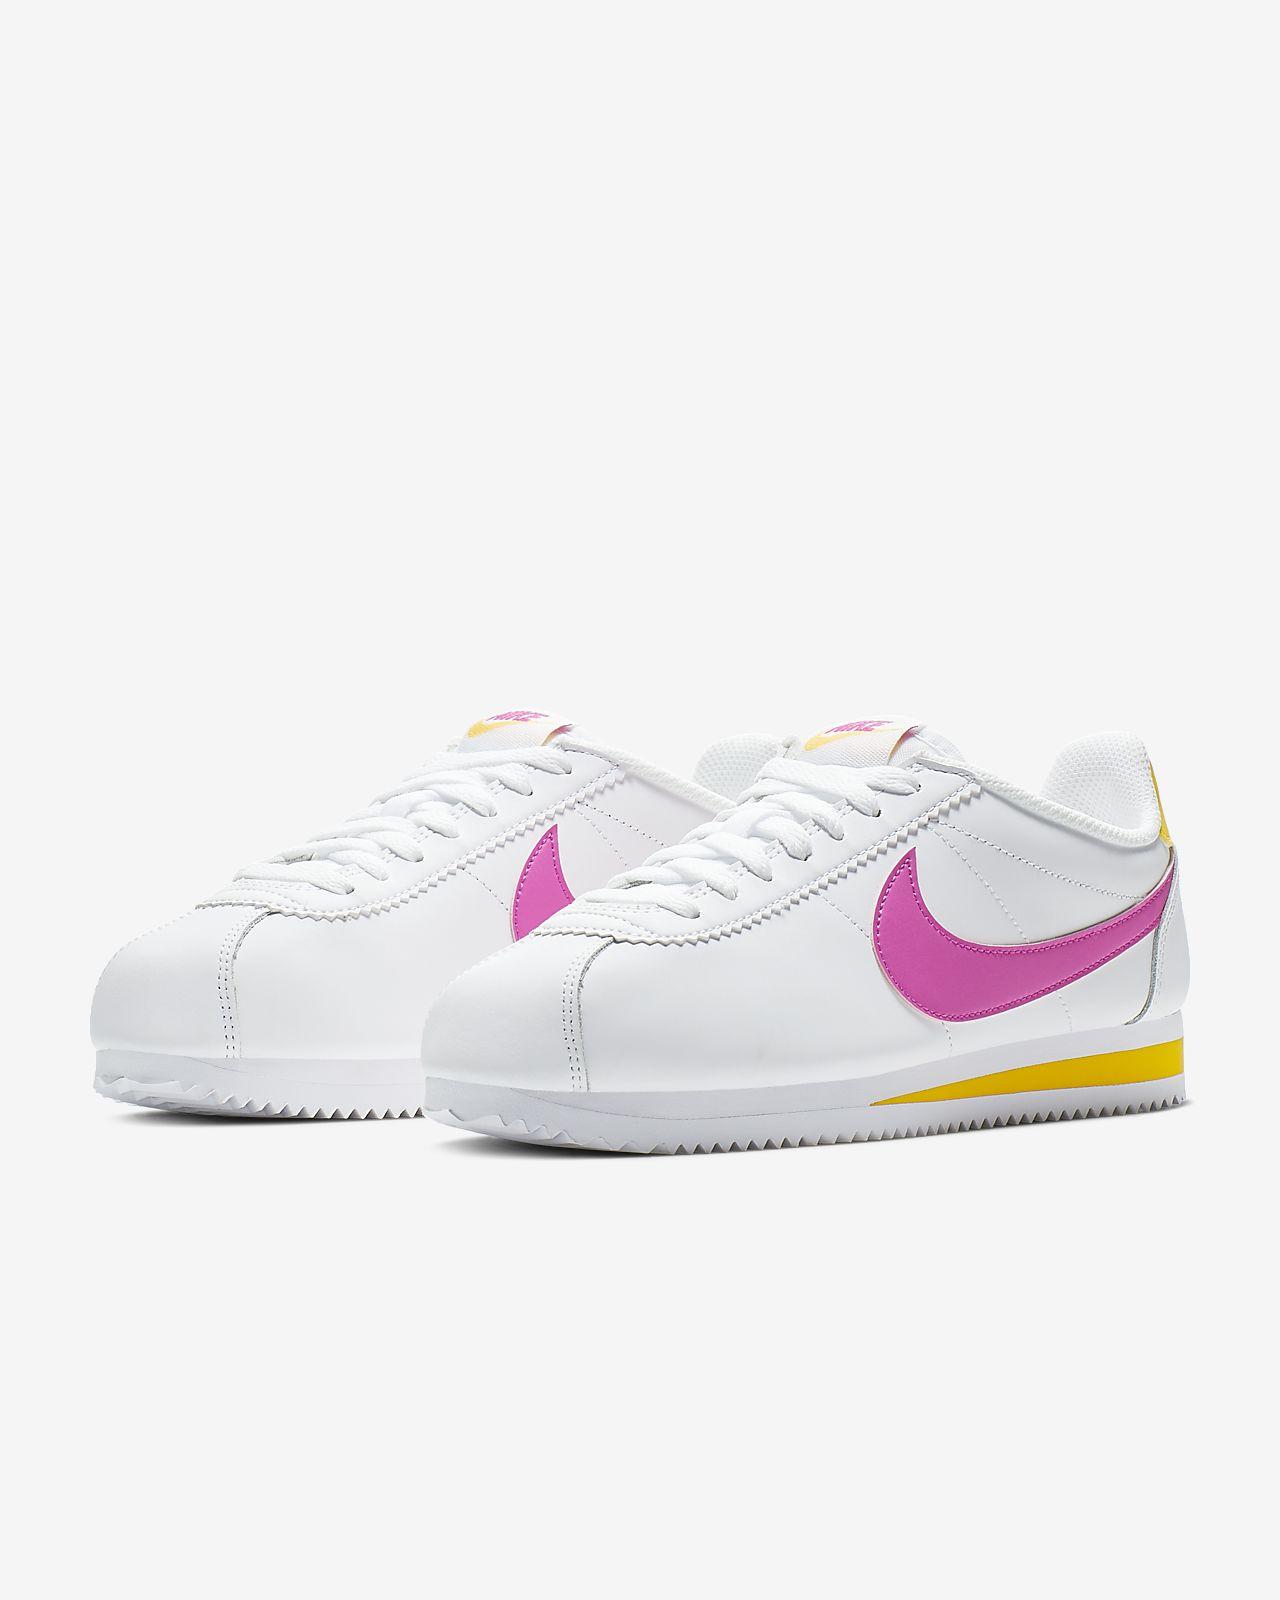 ab9e9269a412 Nike Classic Cortez Women s Shoe. Nike.com GB